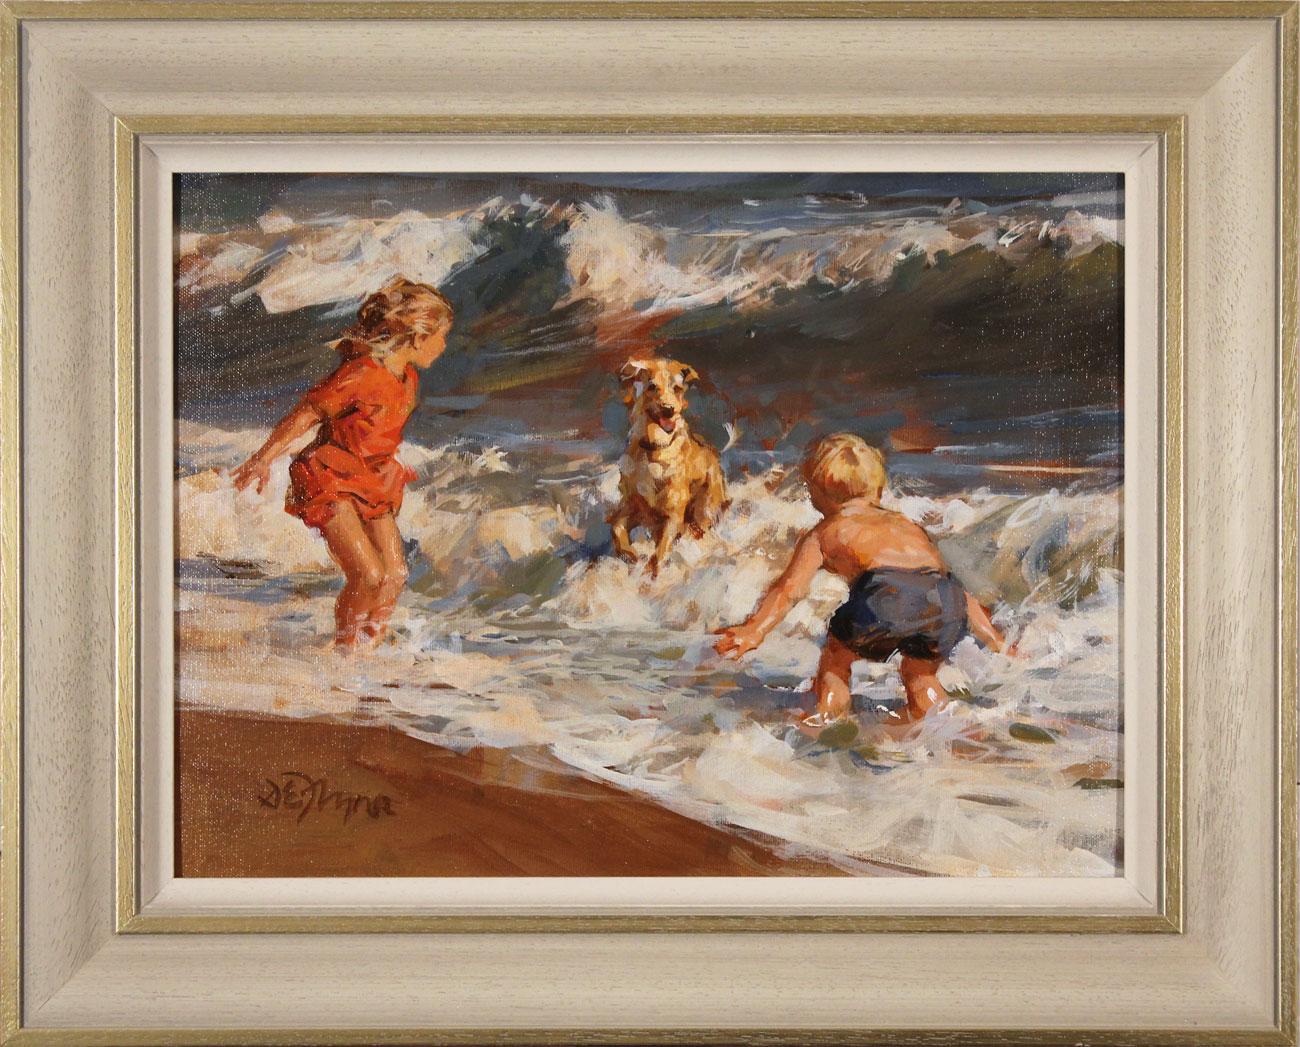 Dianne Flynn, Original acrylic painting on board, Splash! Click to enlarge